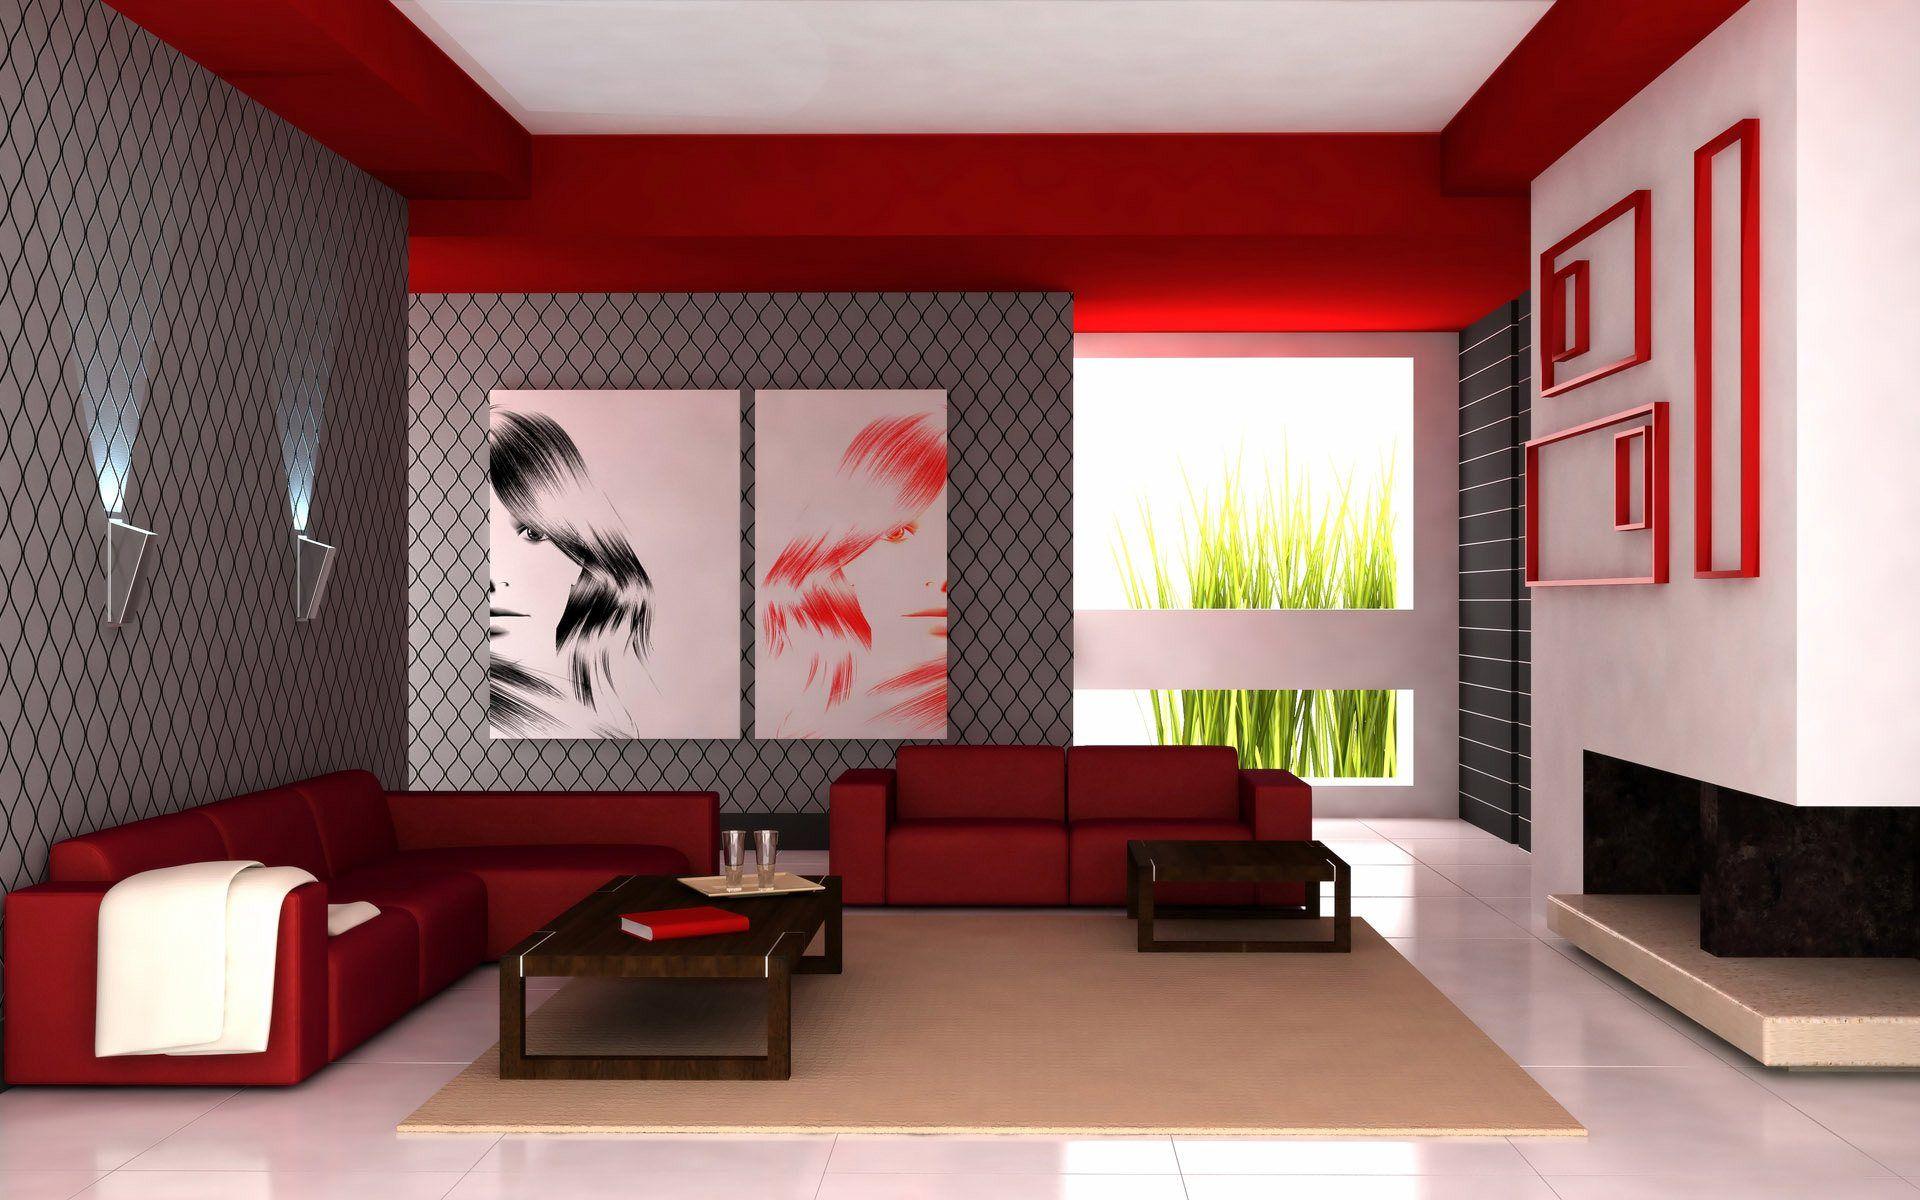 Red Lounge Interior